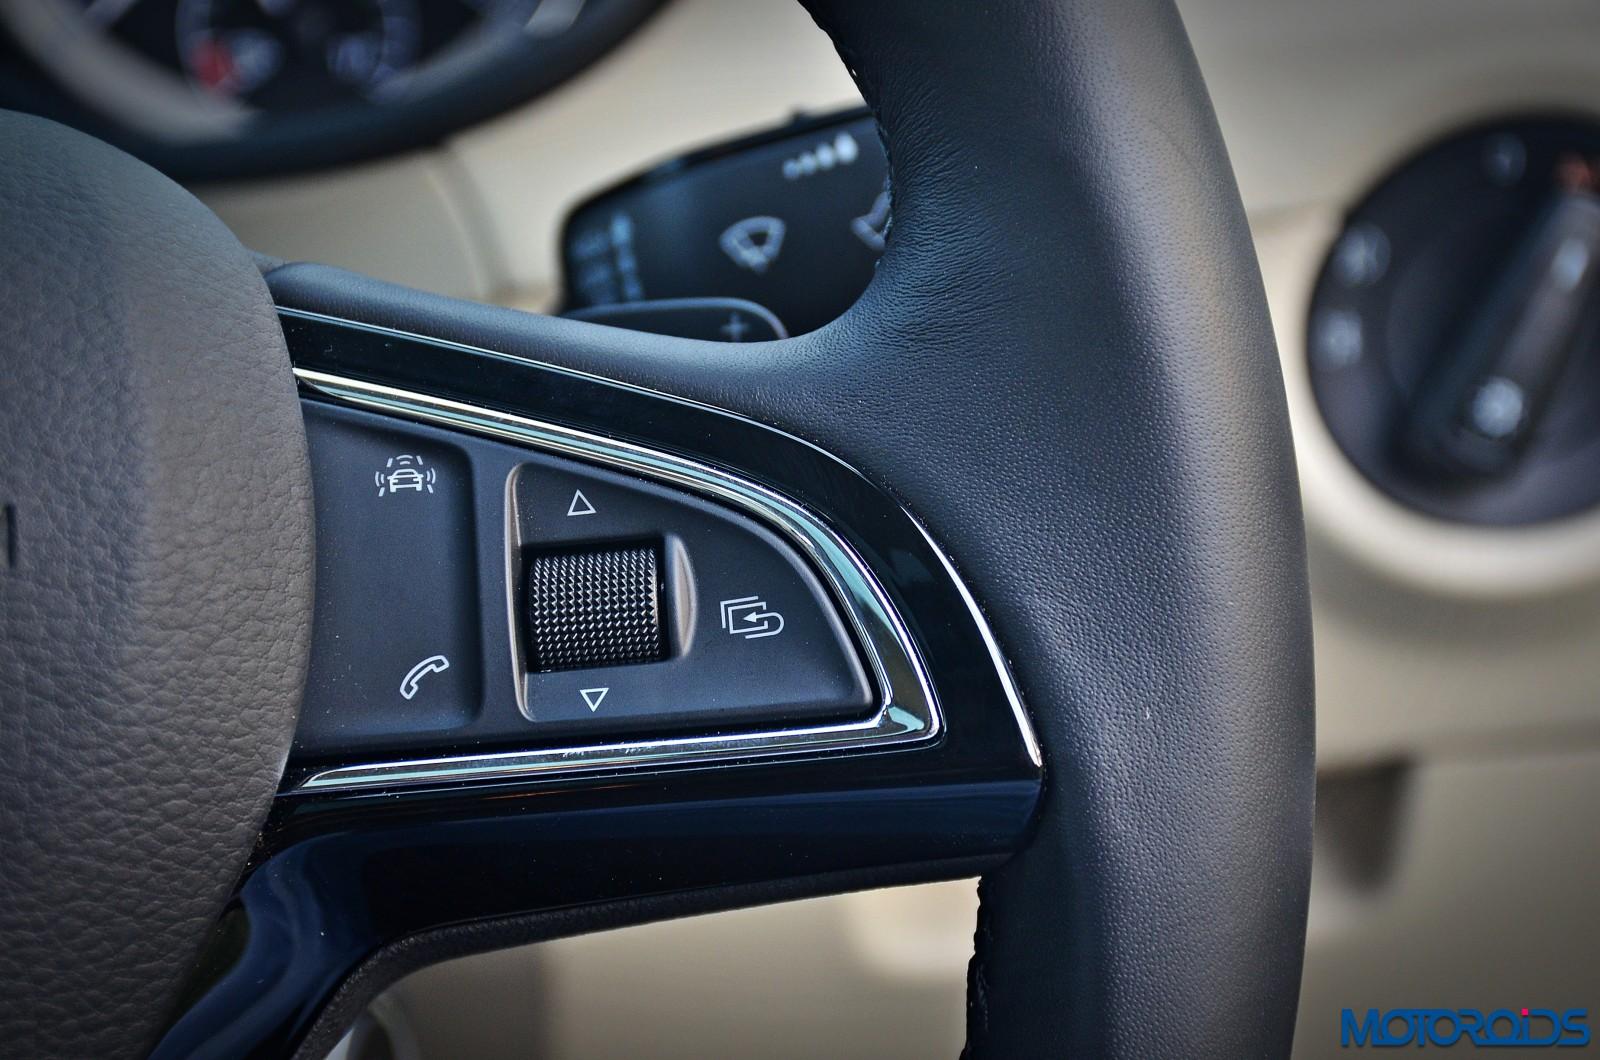 New-2017-Skoda-Octavia-Review-steering-controls